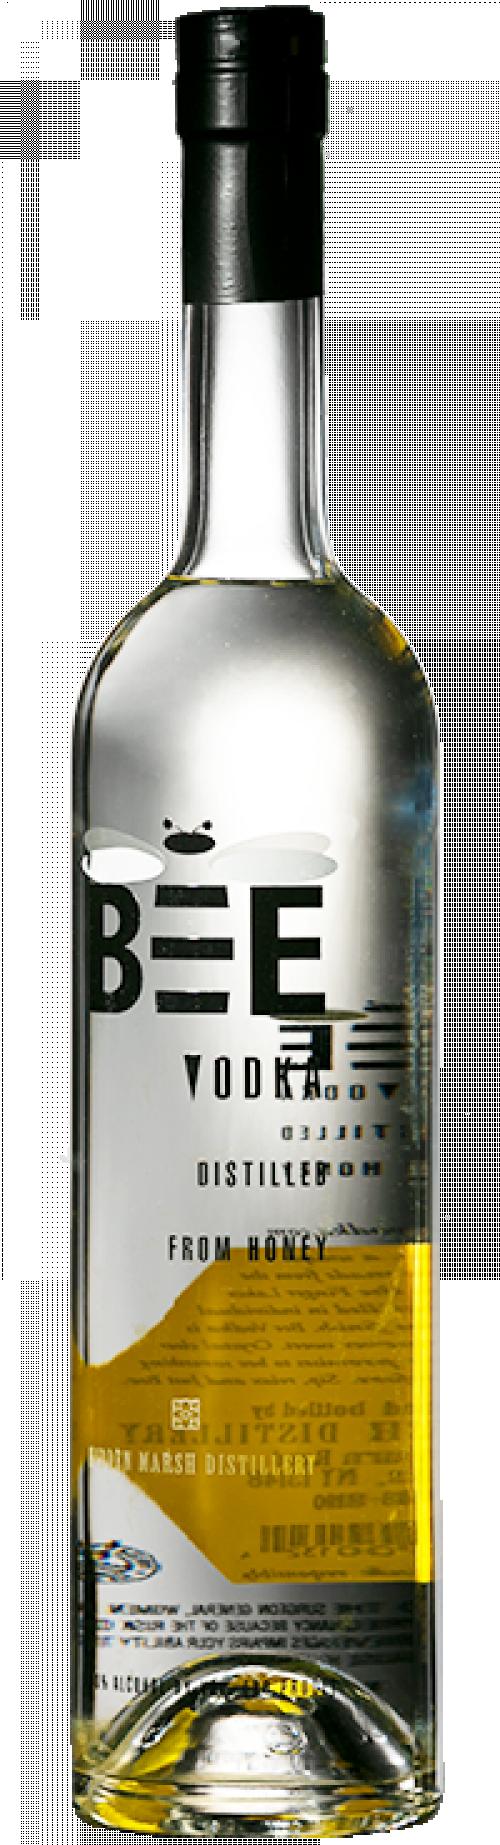 Bee Vodka from Montezuma Winery 750ml